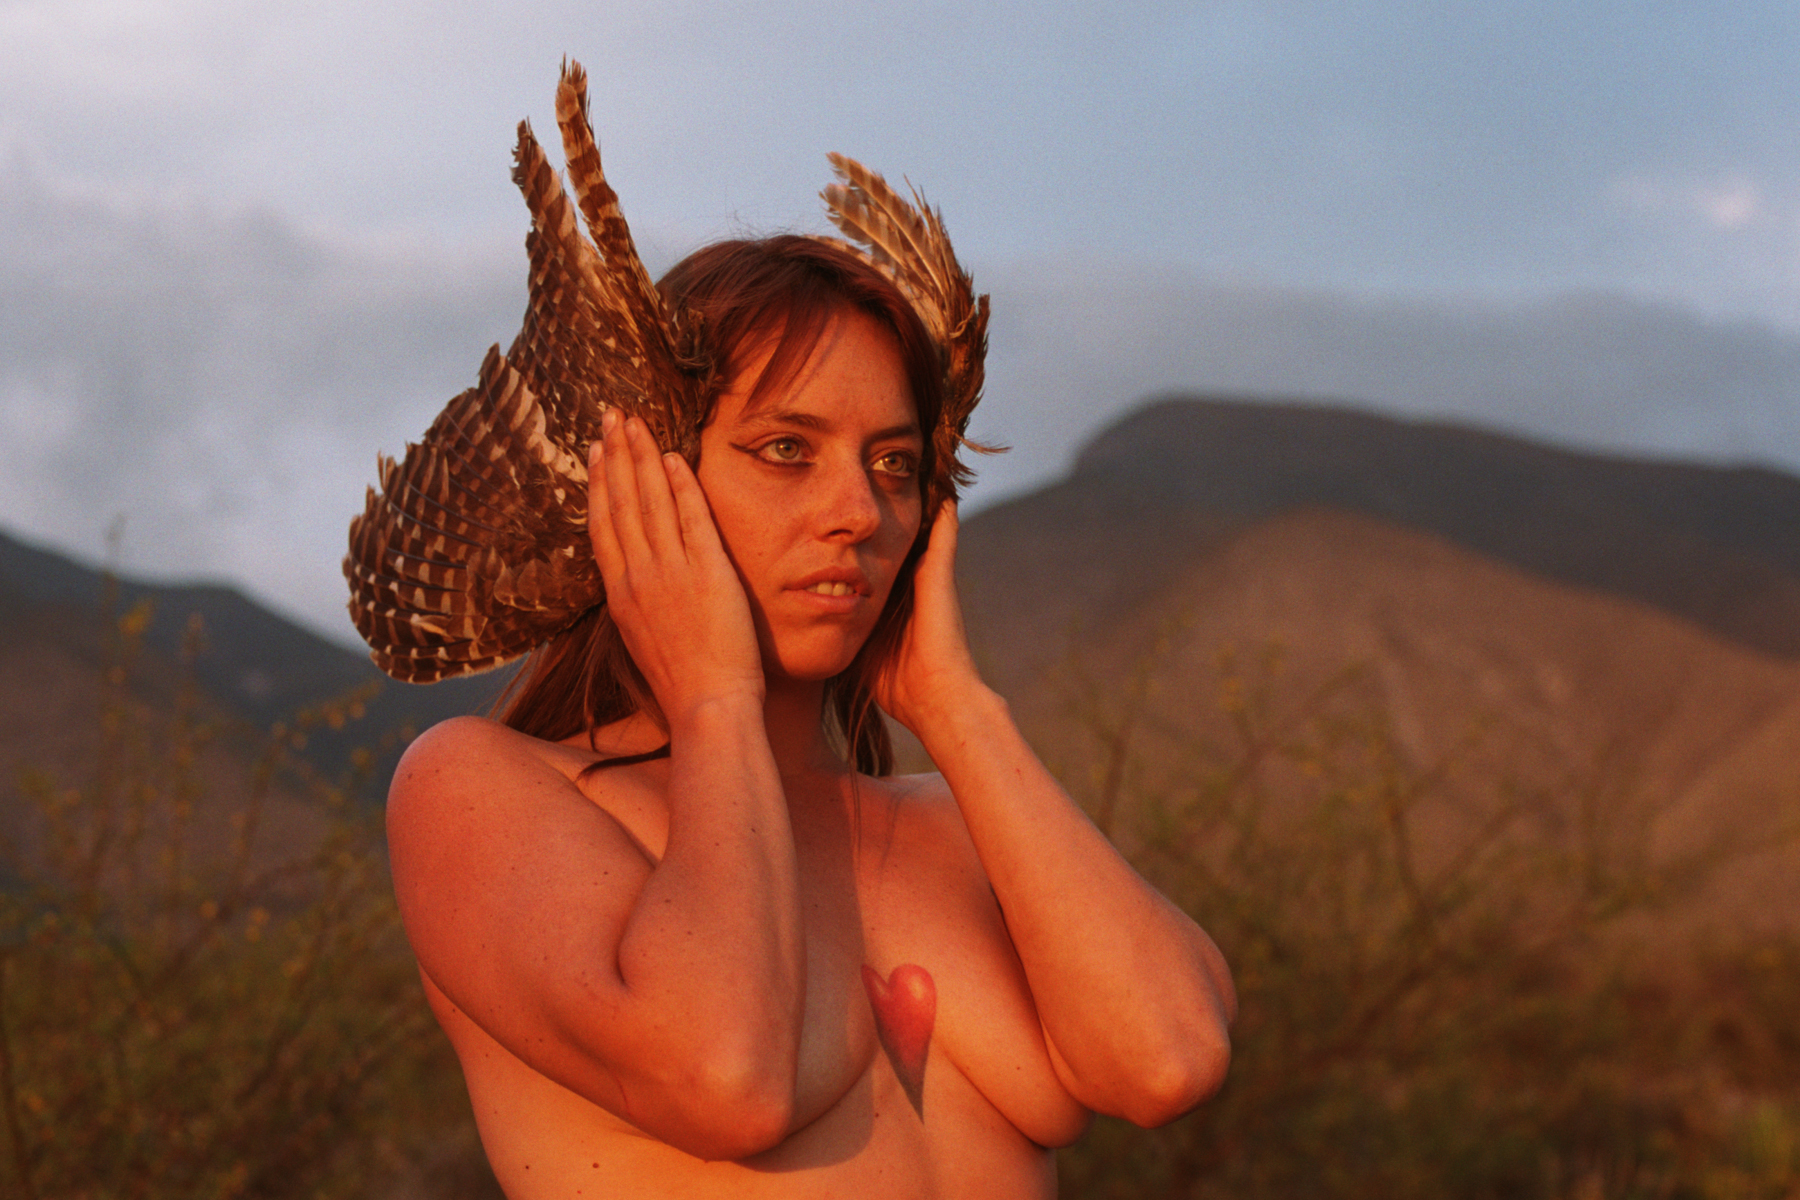 --- She's my guide  --- #clairesashinephotography #clairesashine #photography #35mm #film #travel #cactus #nomadlife #ceremony #spiritual #ontheroad #welivetoexplore #Mexico #Catorce #realdecatorce #sacredfeminine #goddess #divinefeminine #witch #womenempowerment #wings #owl #heart #shaman #sunset #nude #nature #naked